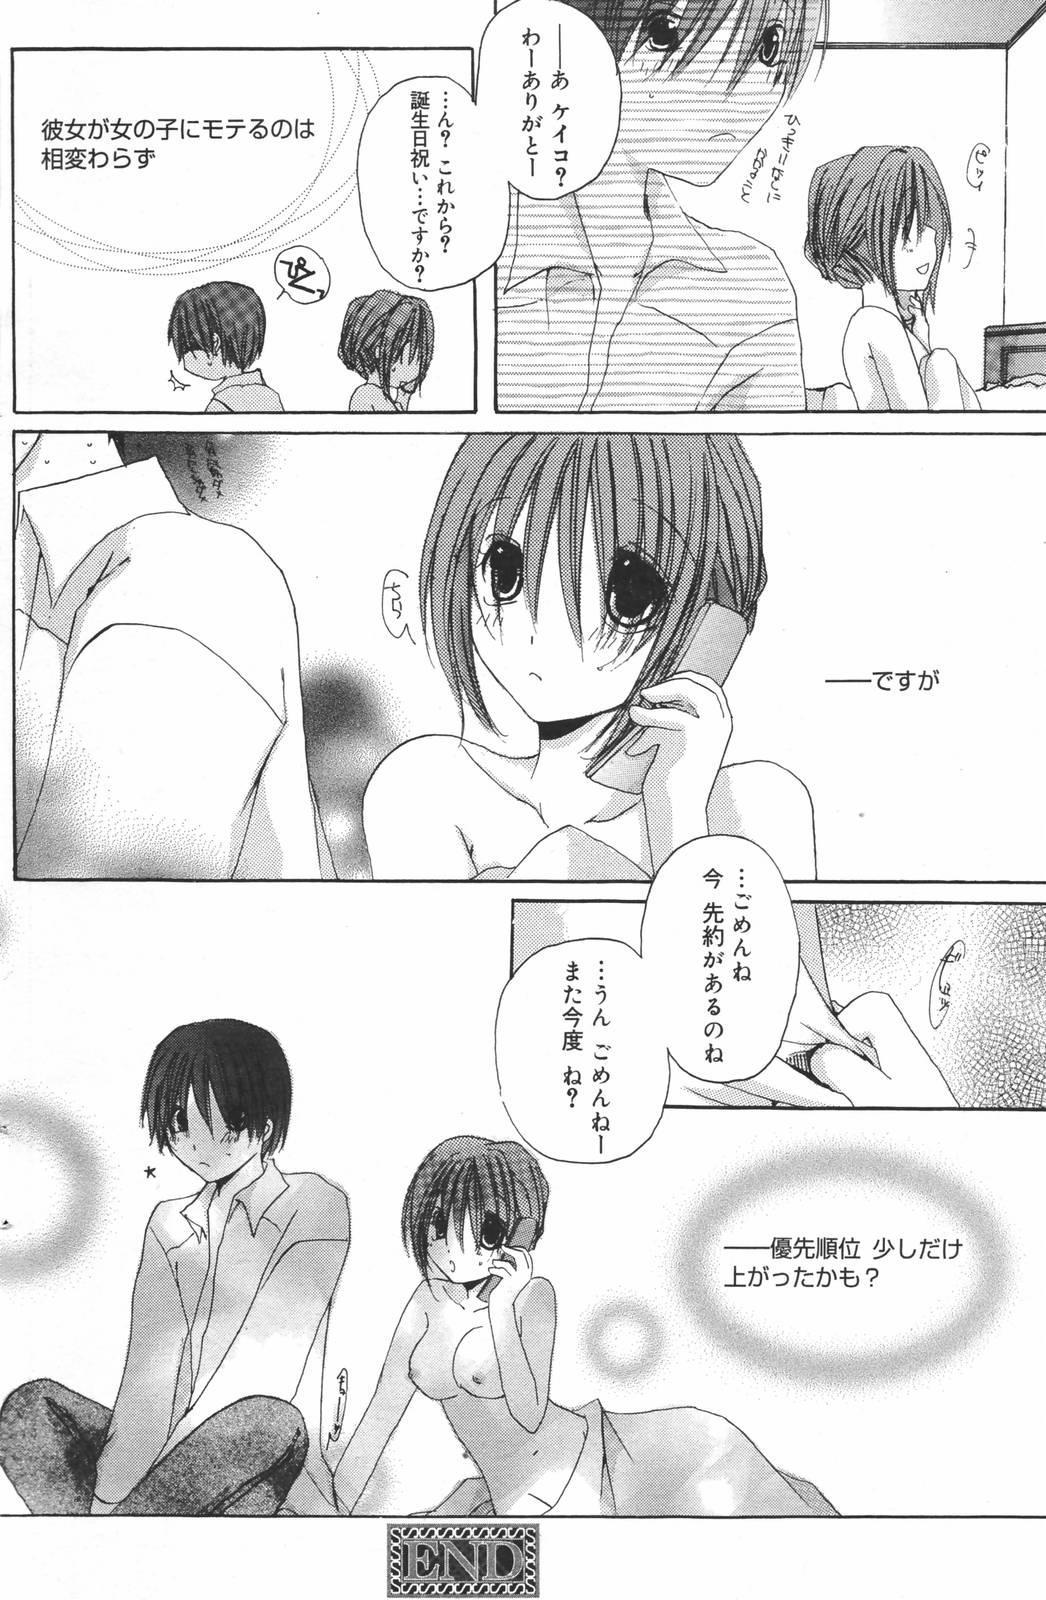 Manga Bangaichi 2007-03 125